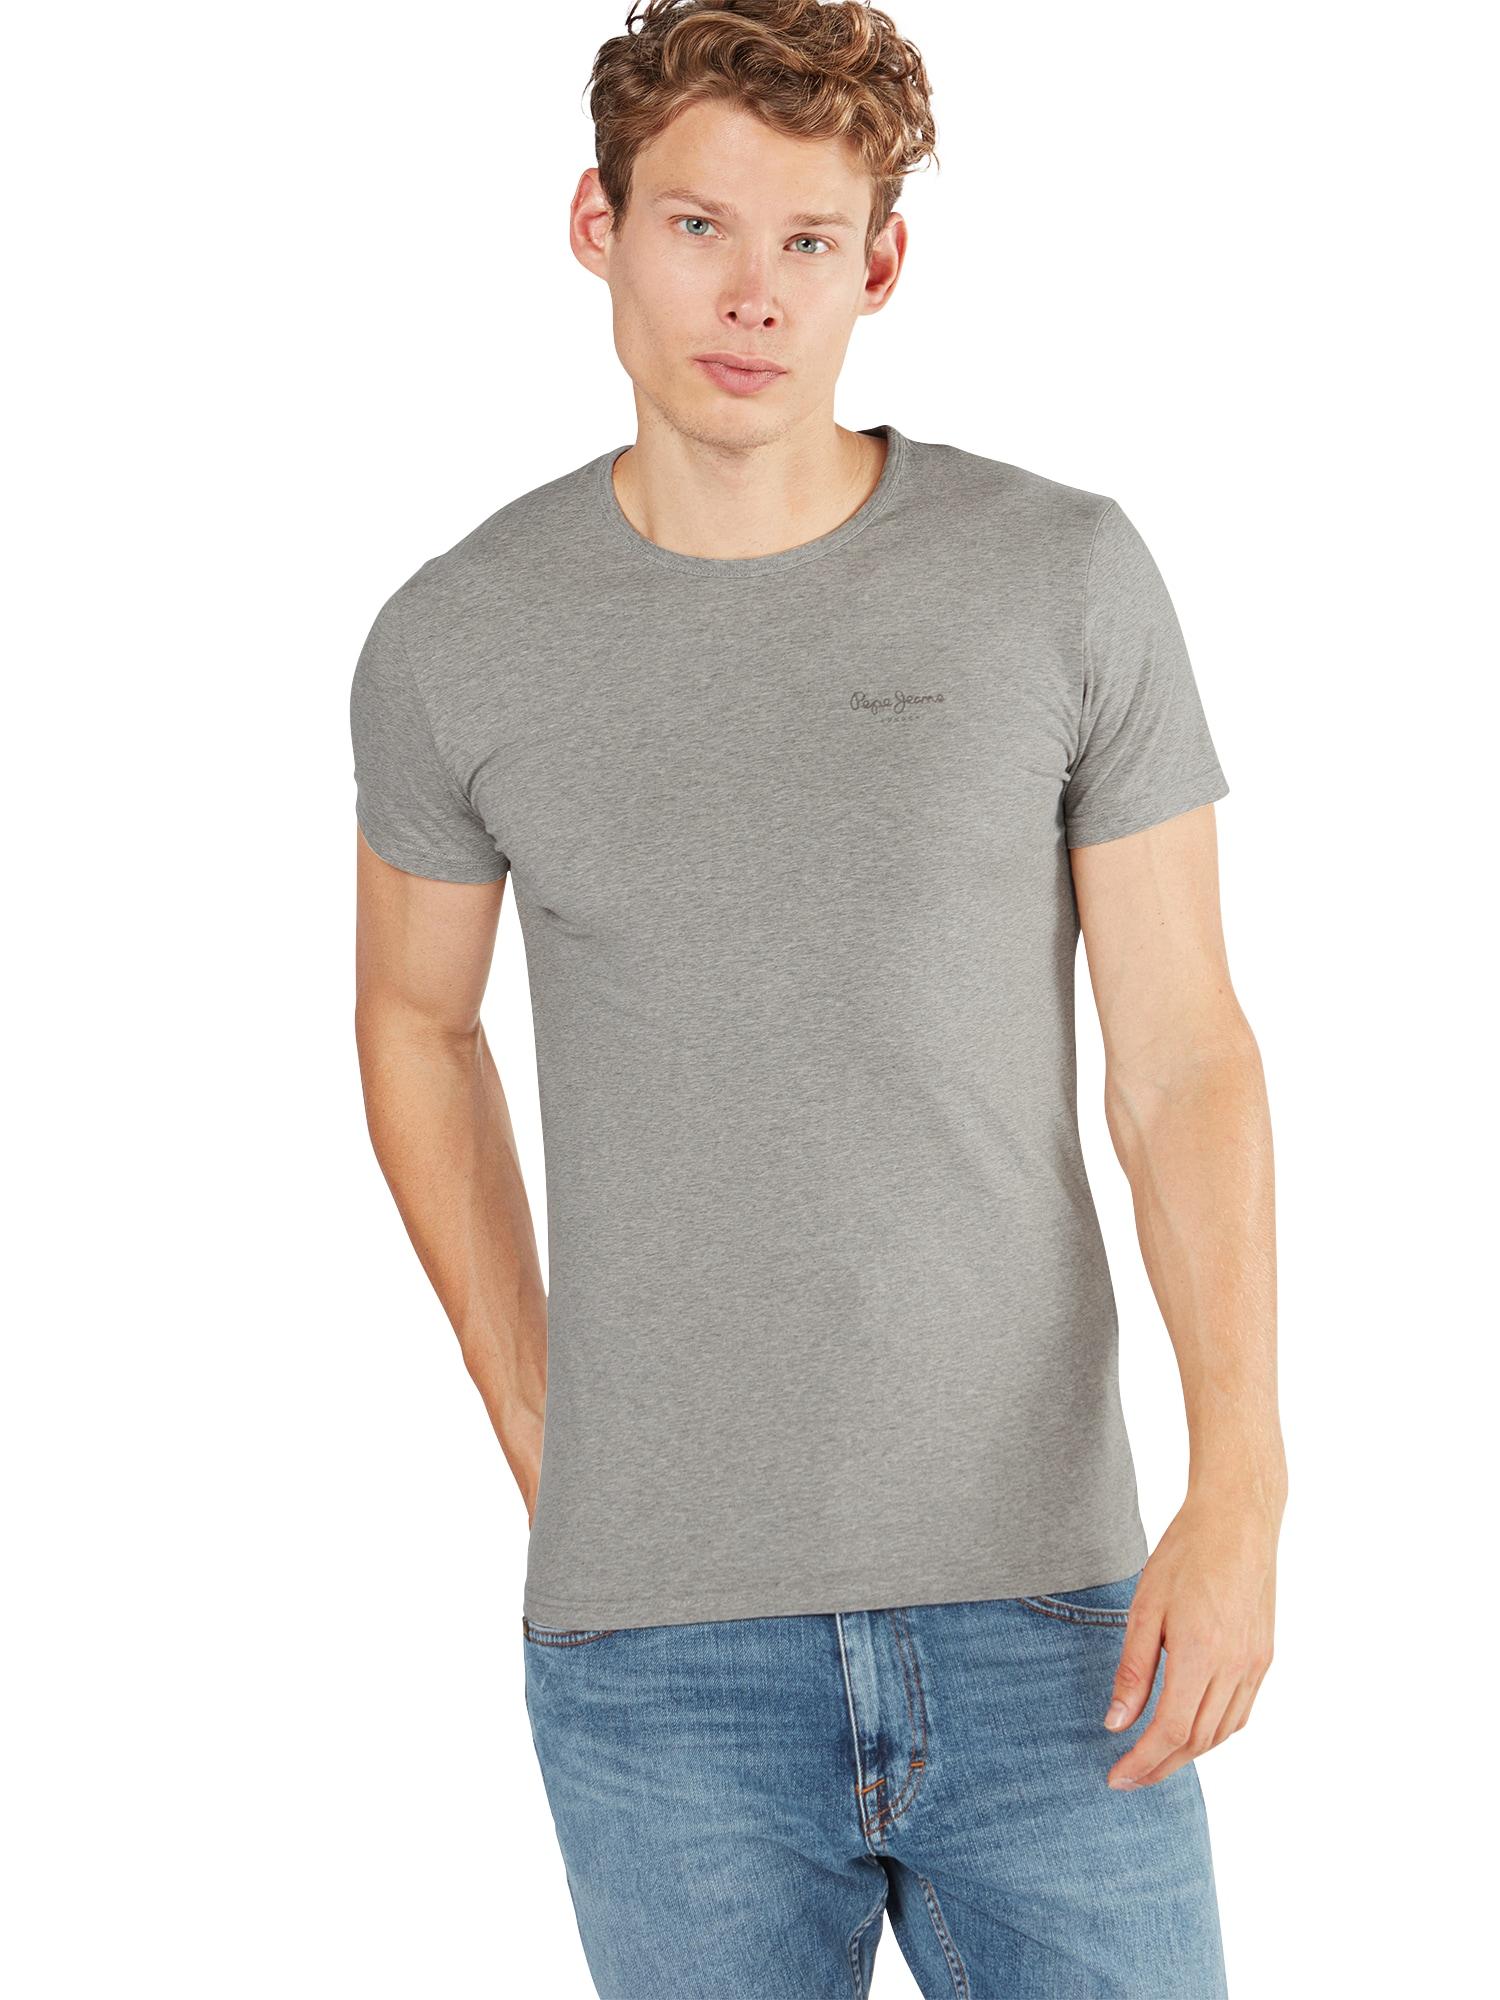 Pepe Jeans T-shirt 'ORIGINAL BASIC S/S'  gråmelerad